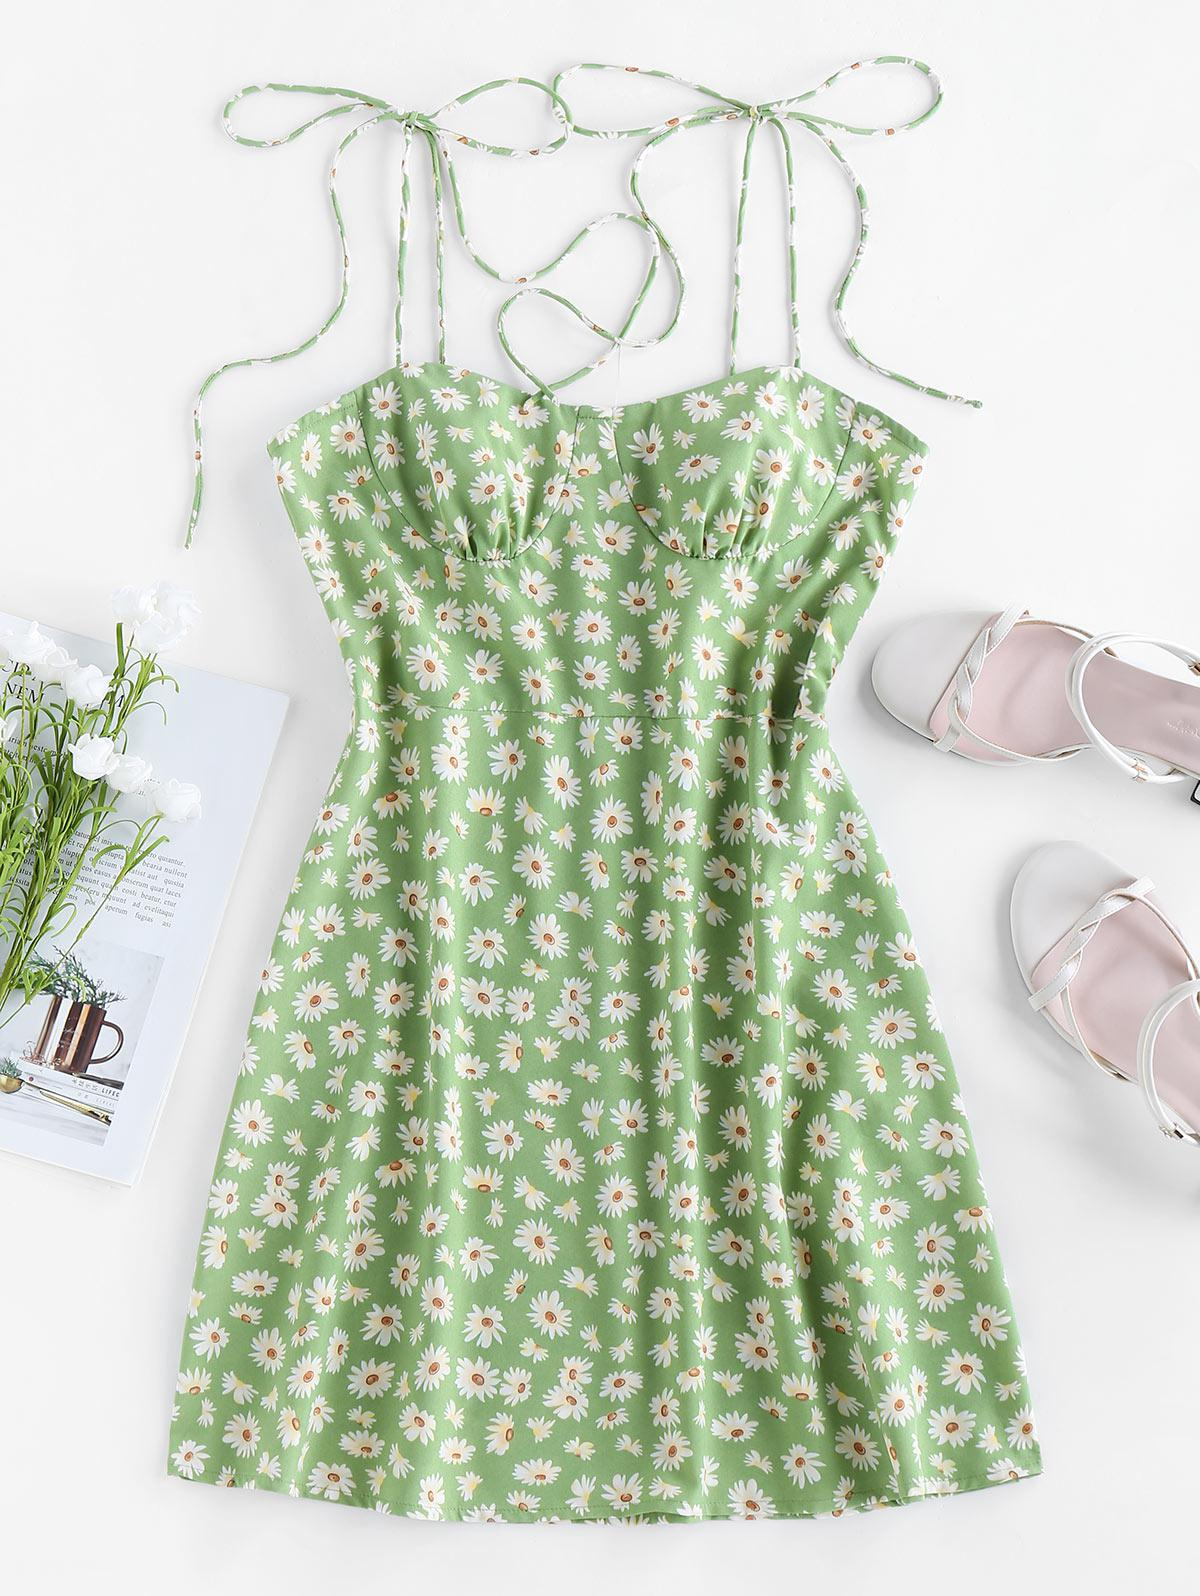 ZAFUL Backless Ditsy Print Tie Shoulder Dress